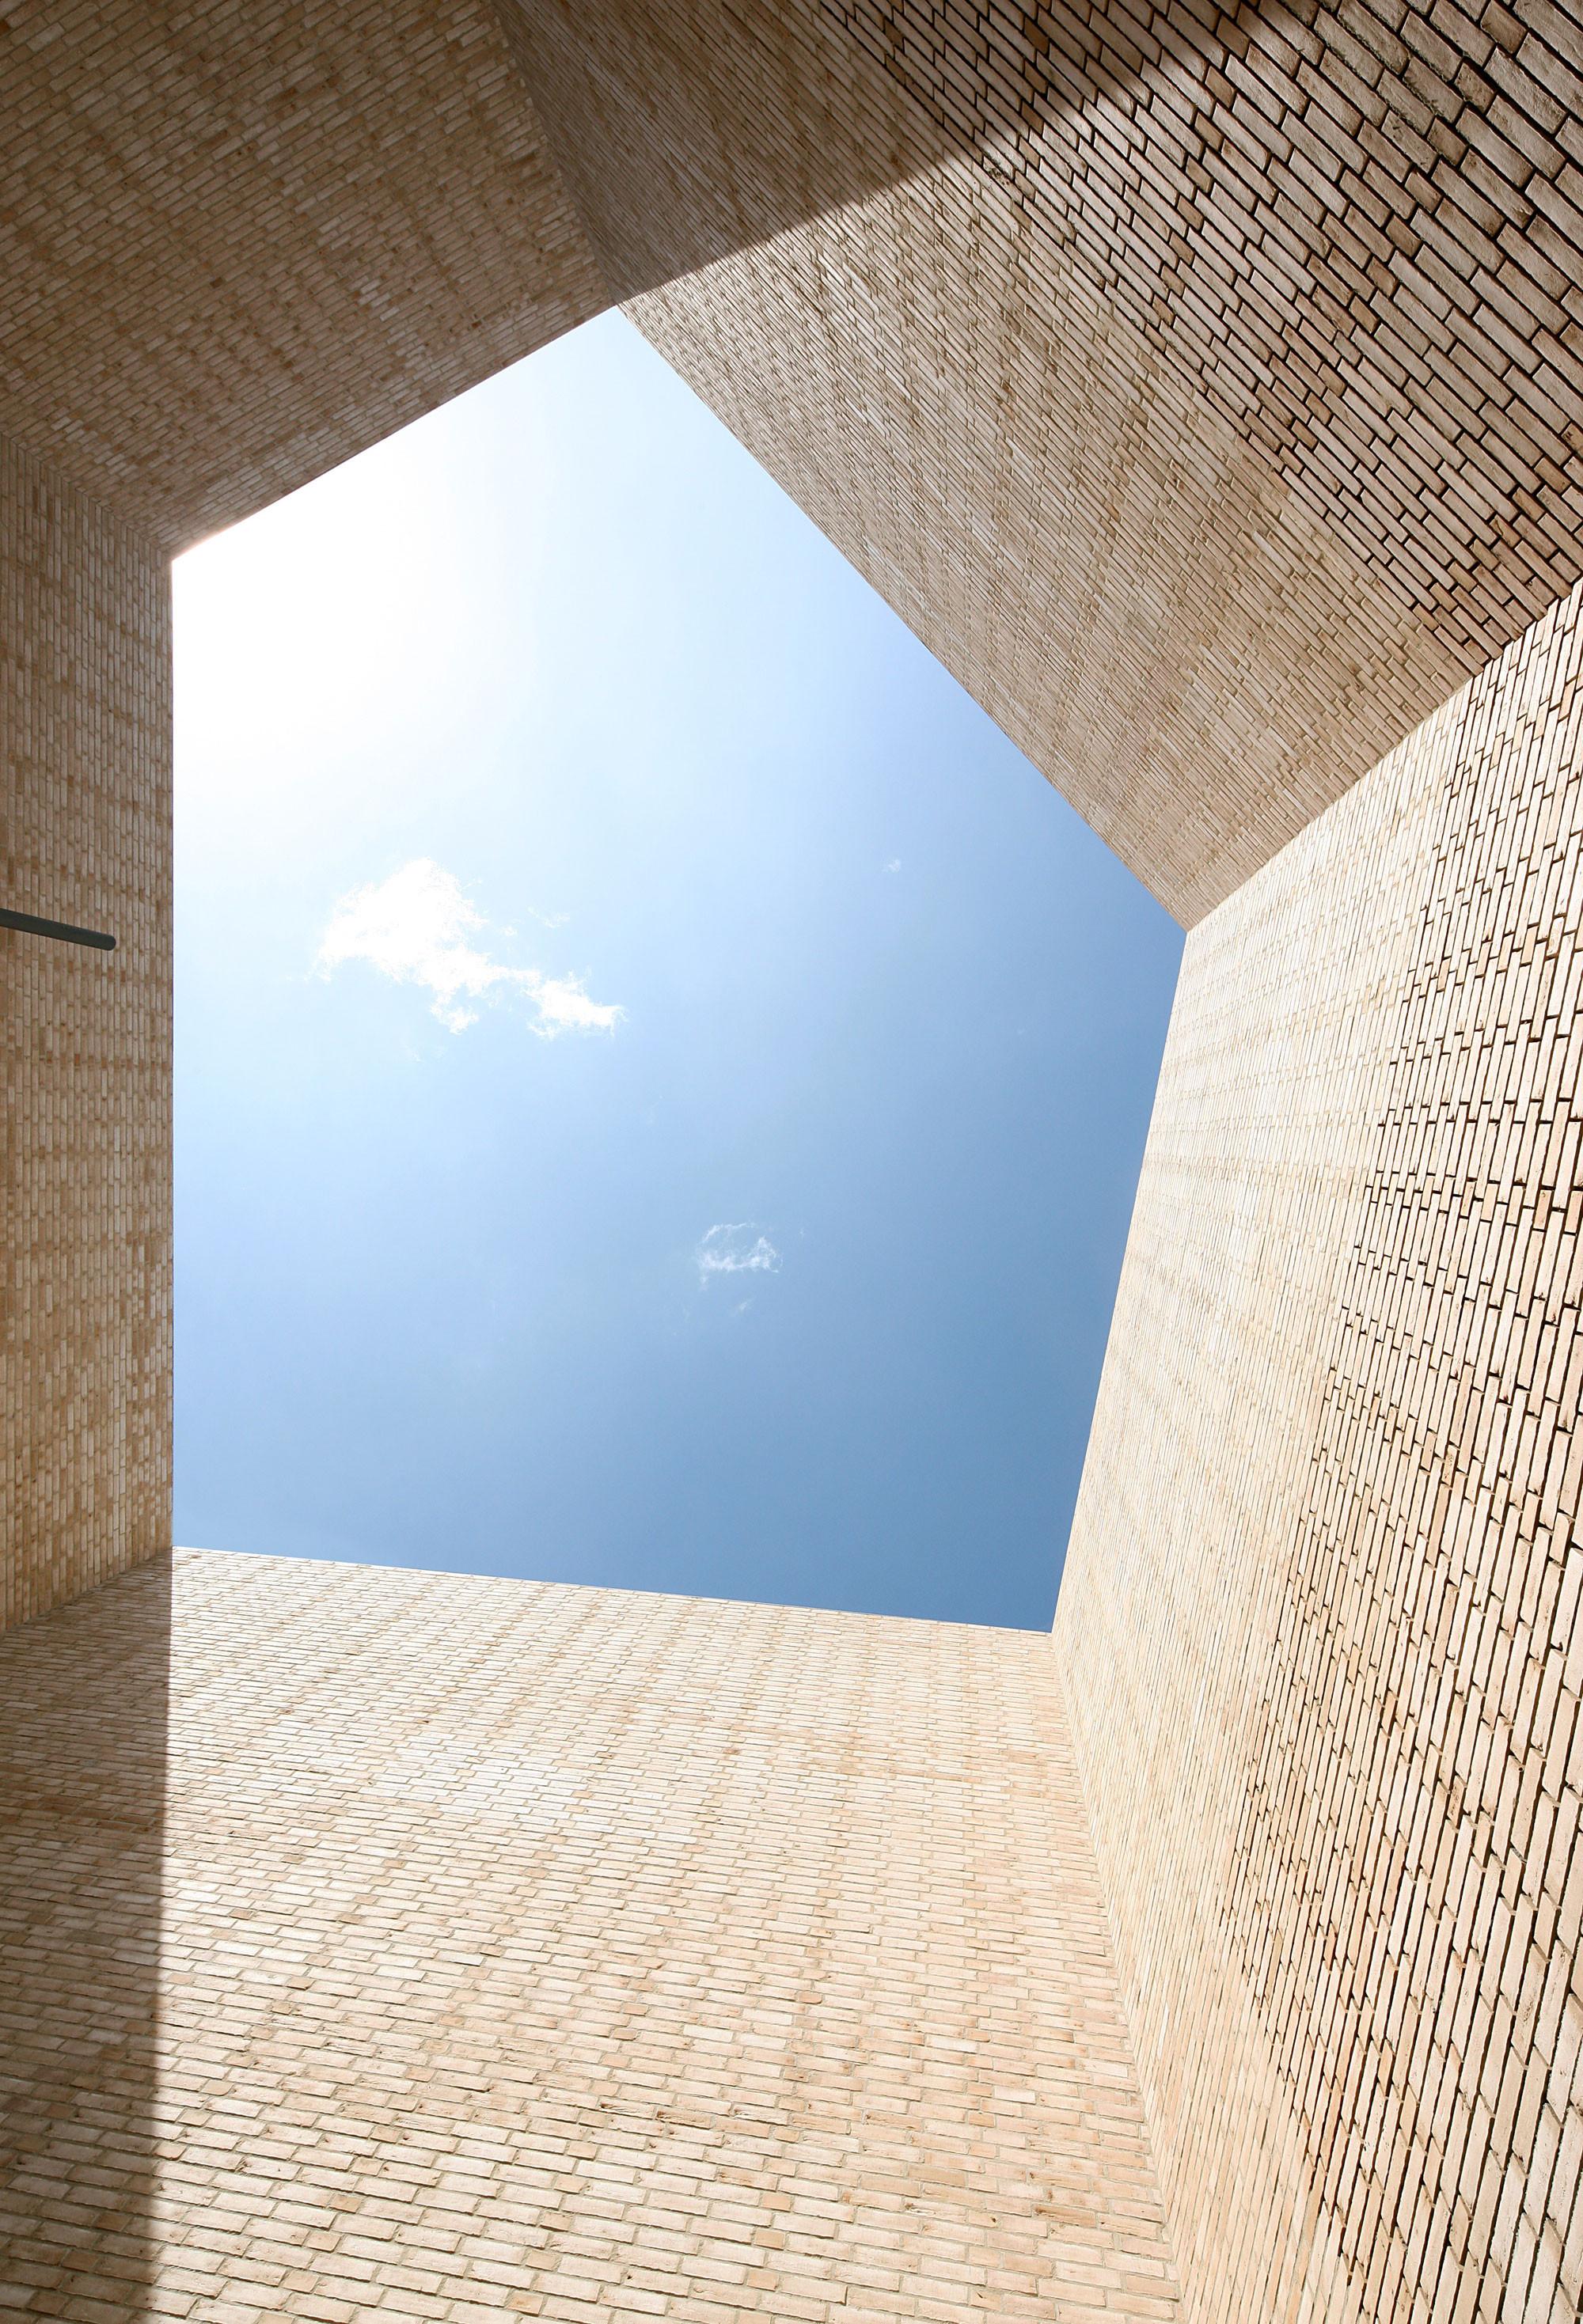 Gallery of buda art centre 51n4e 2 for Dujardin kortrijk